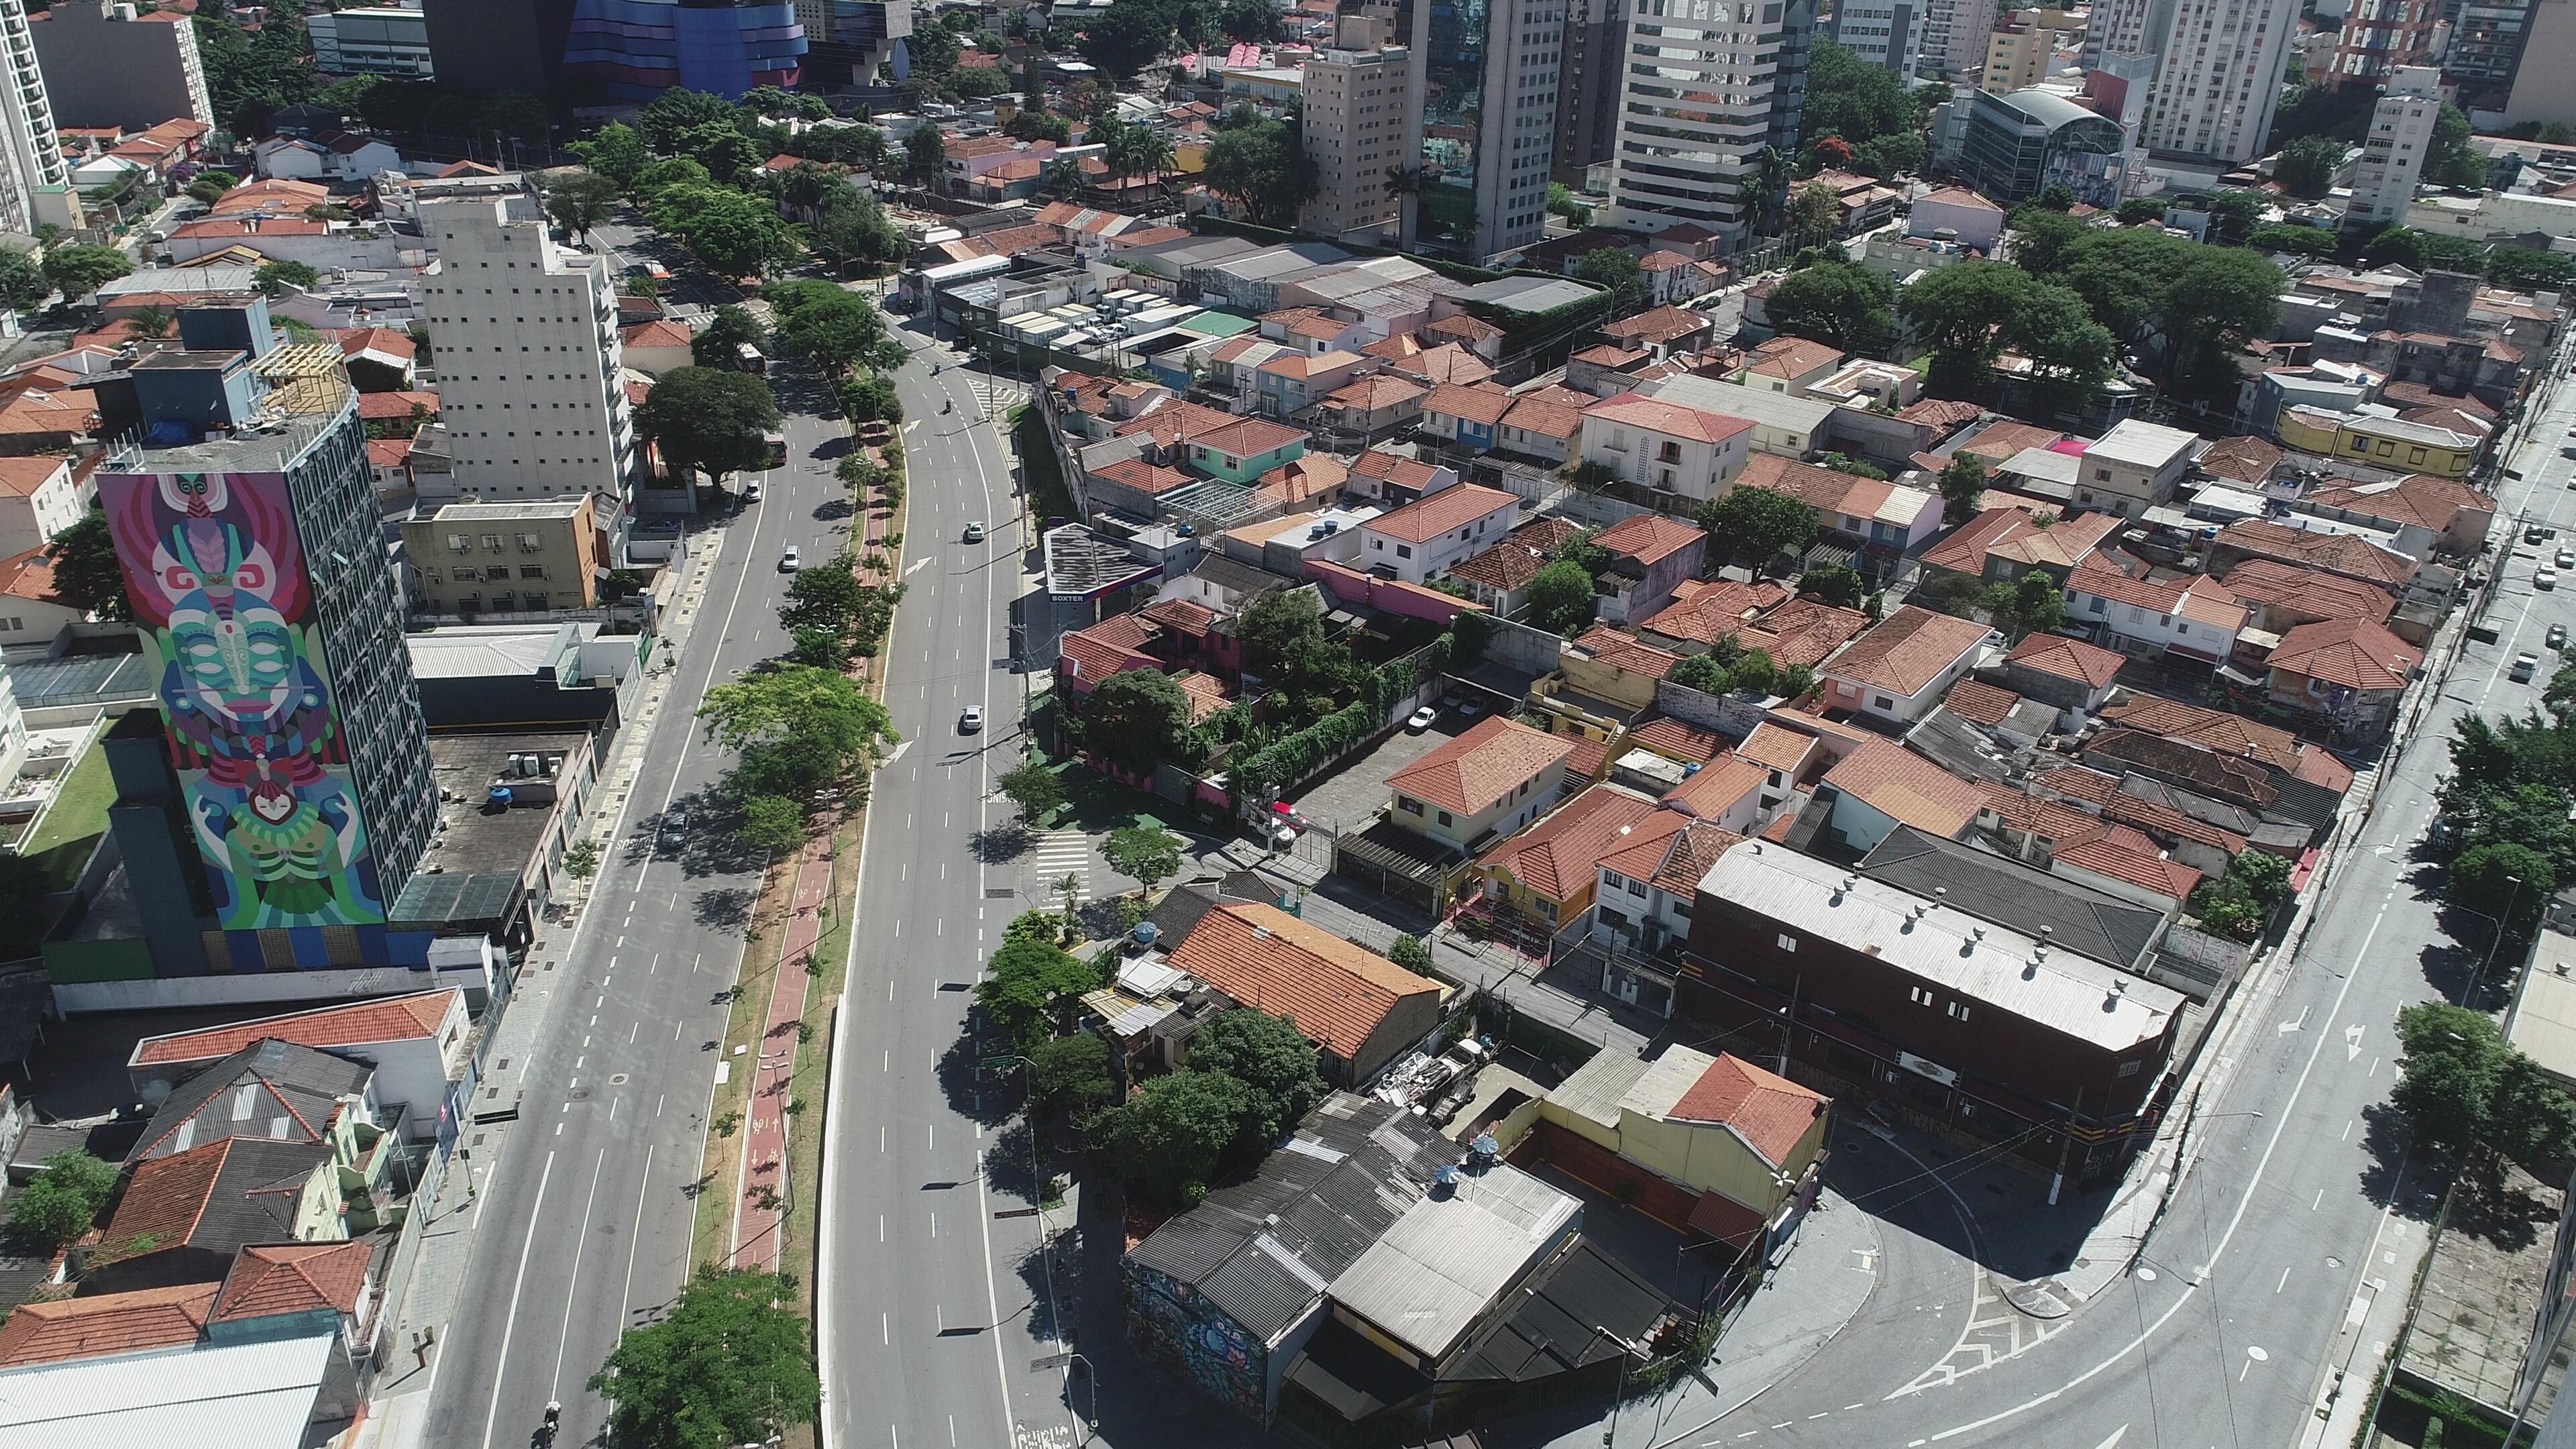 Imagen de drone del centro de San Pablo (REUTERS/Leonardo Benassatto)